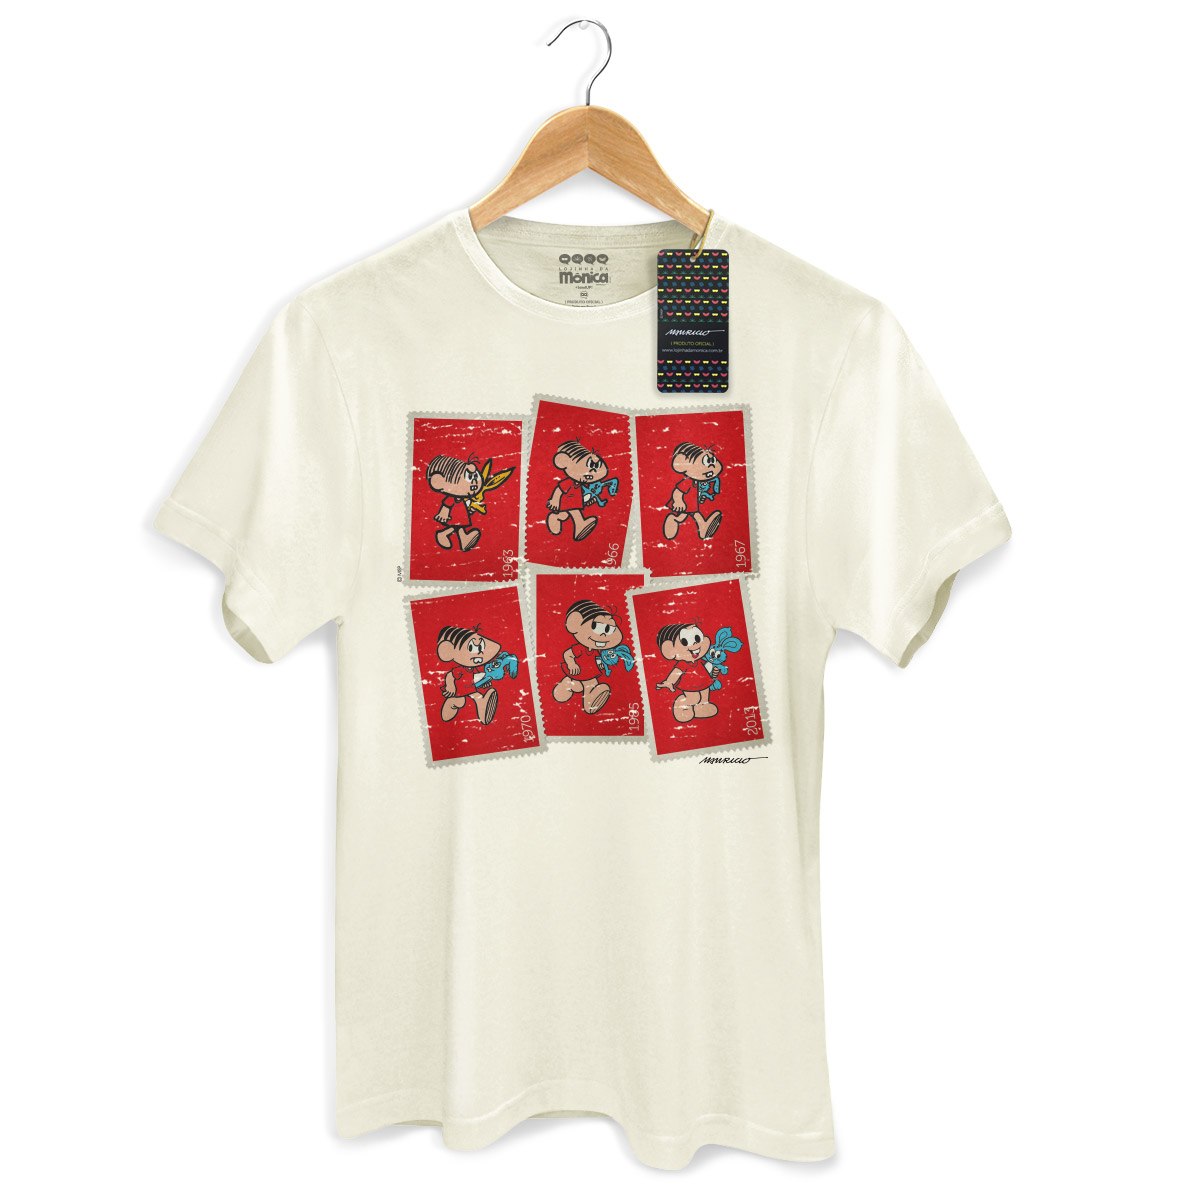 Camiseta Masculina Turma da M�nica 50 Anos Evolu��o Modelo 3